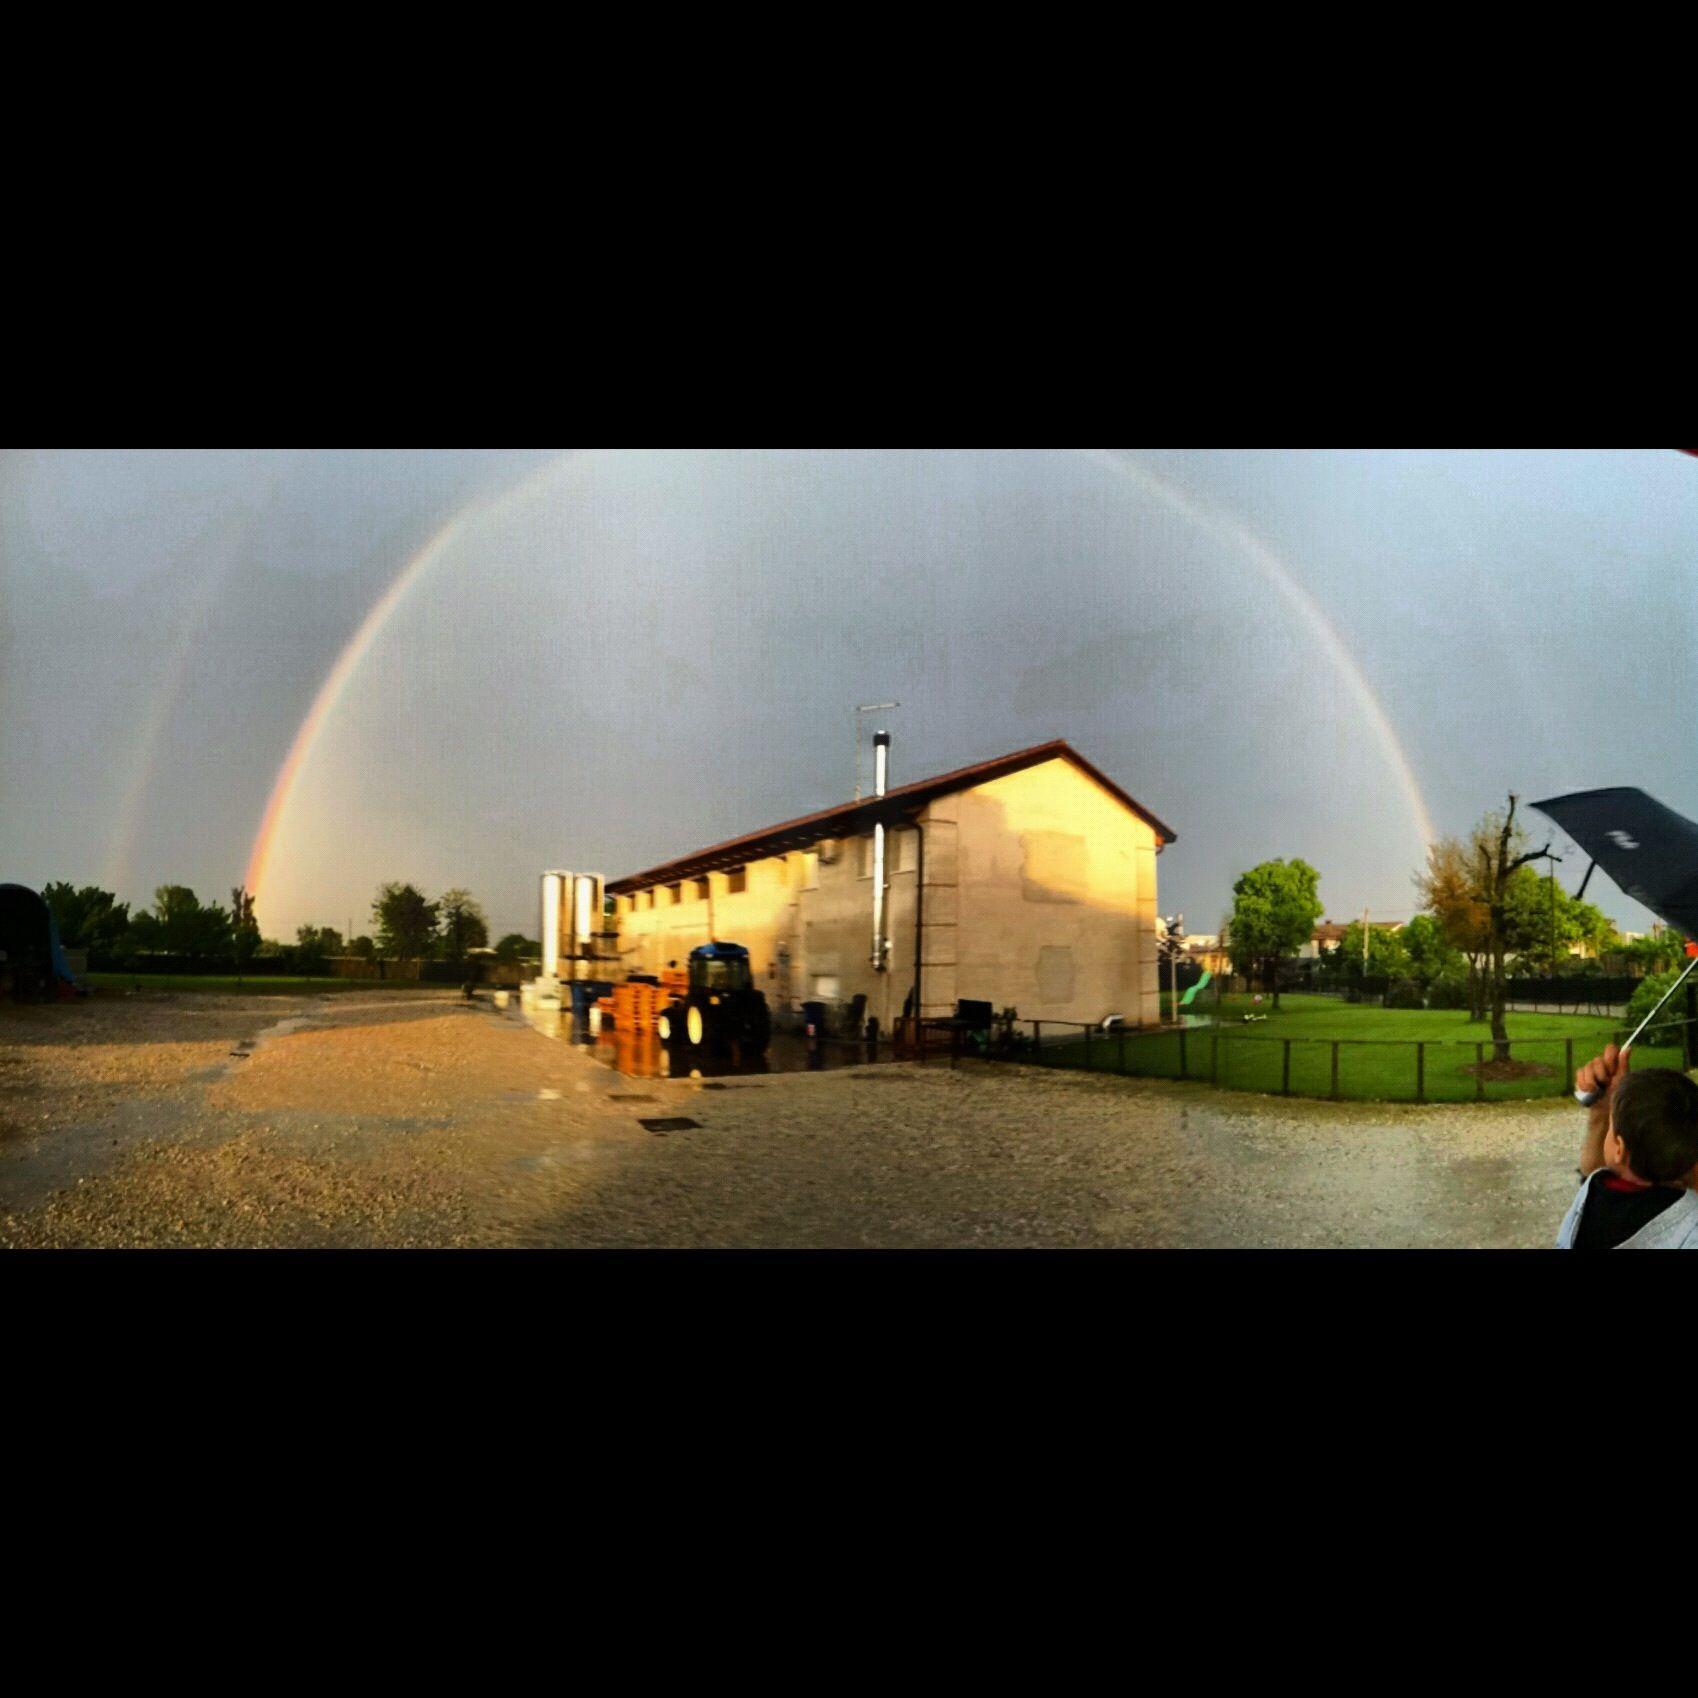 arcobaleno sopra la cantina